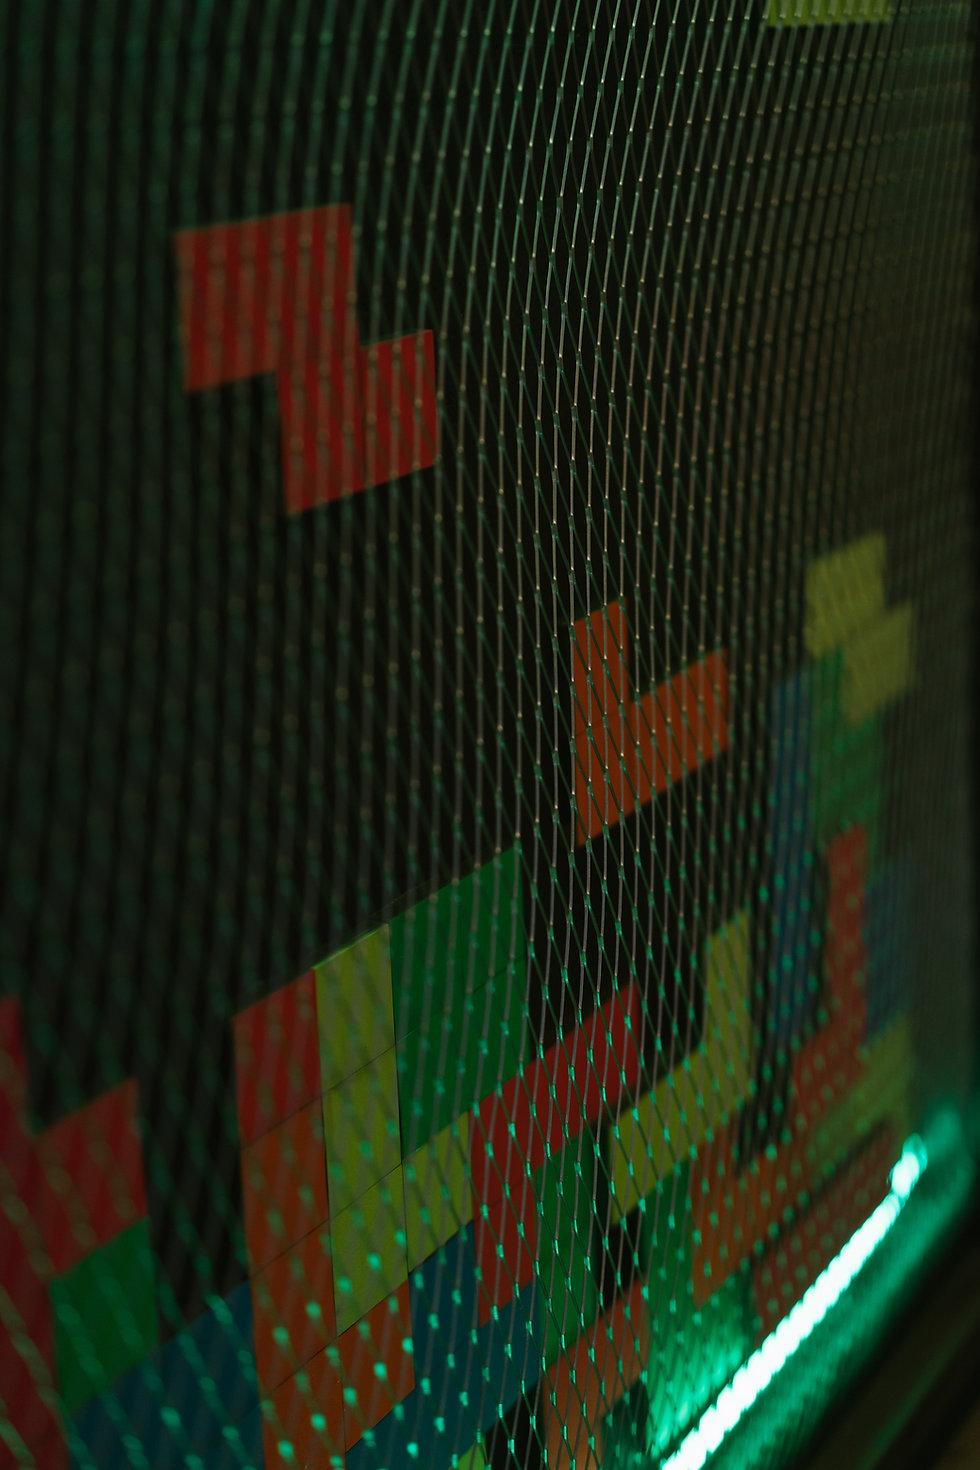 pexels-mikhail-nilov-8108665.jpg